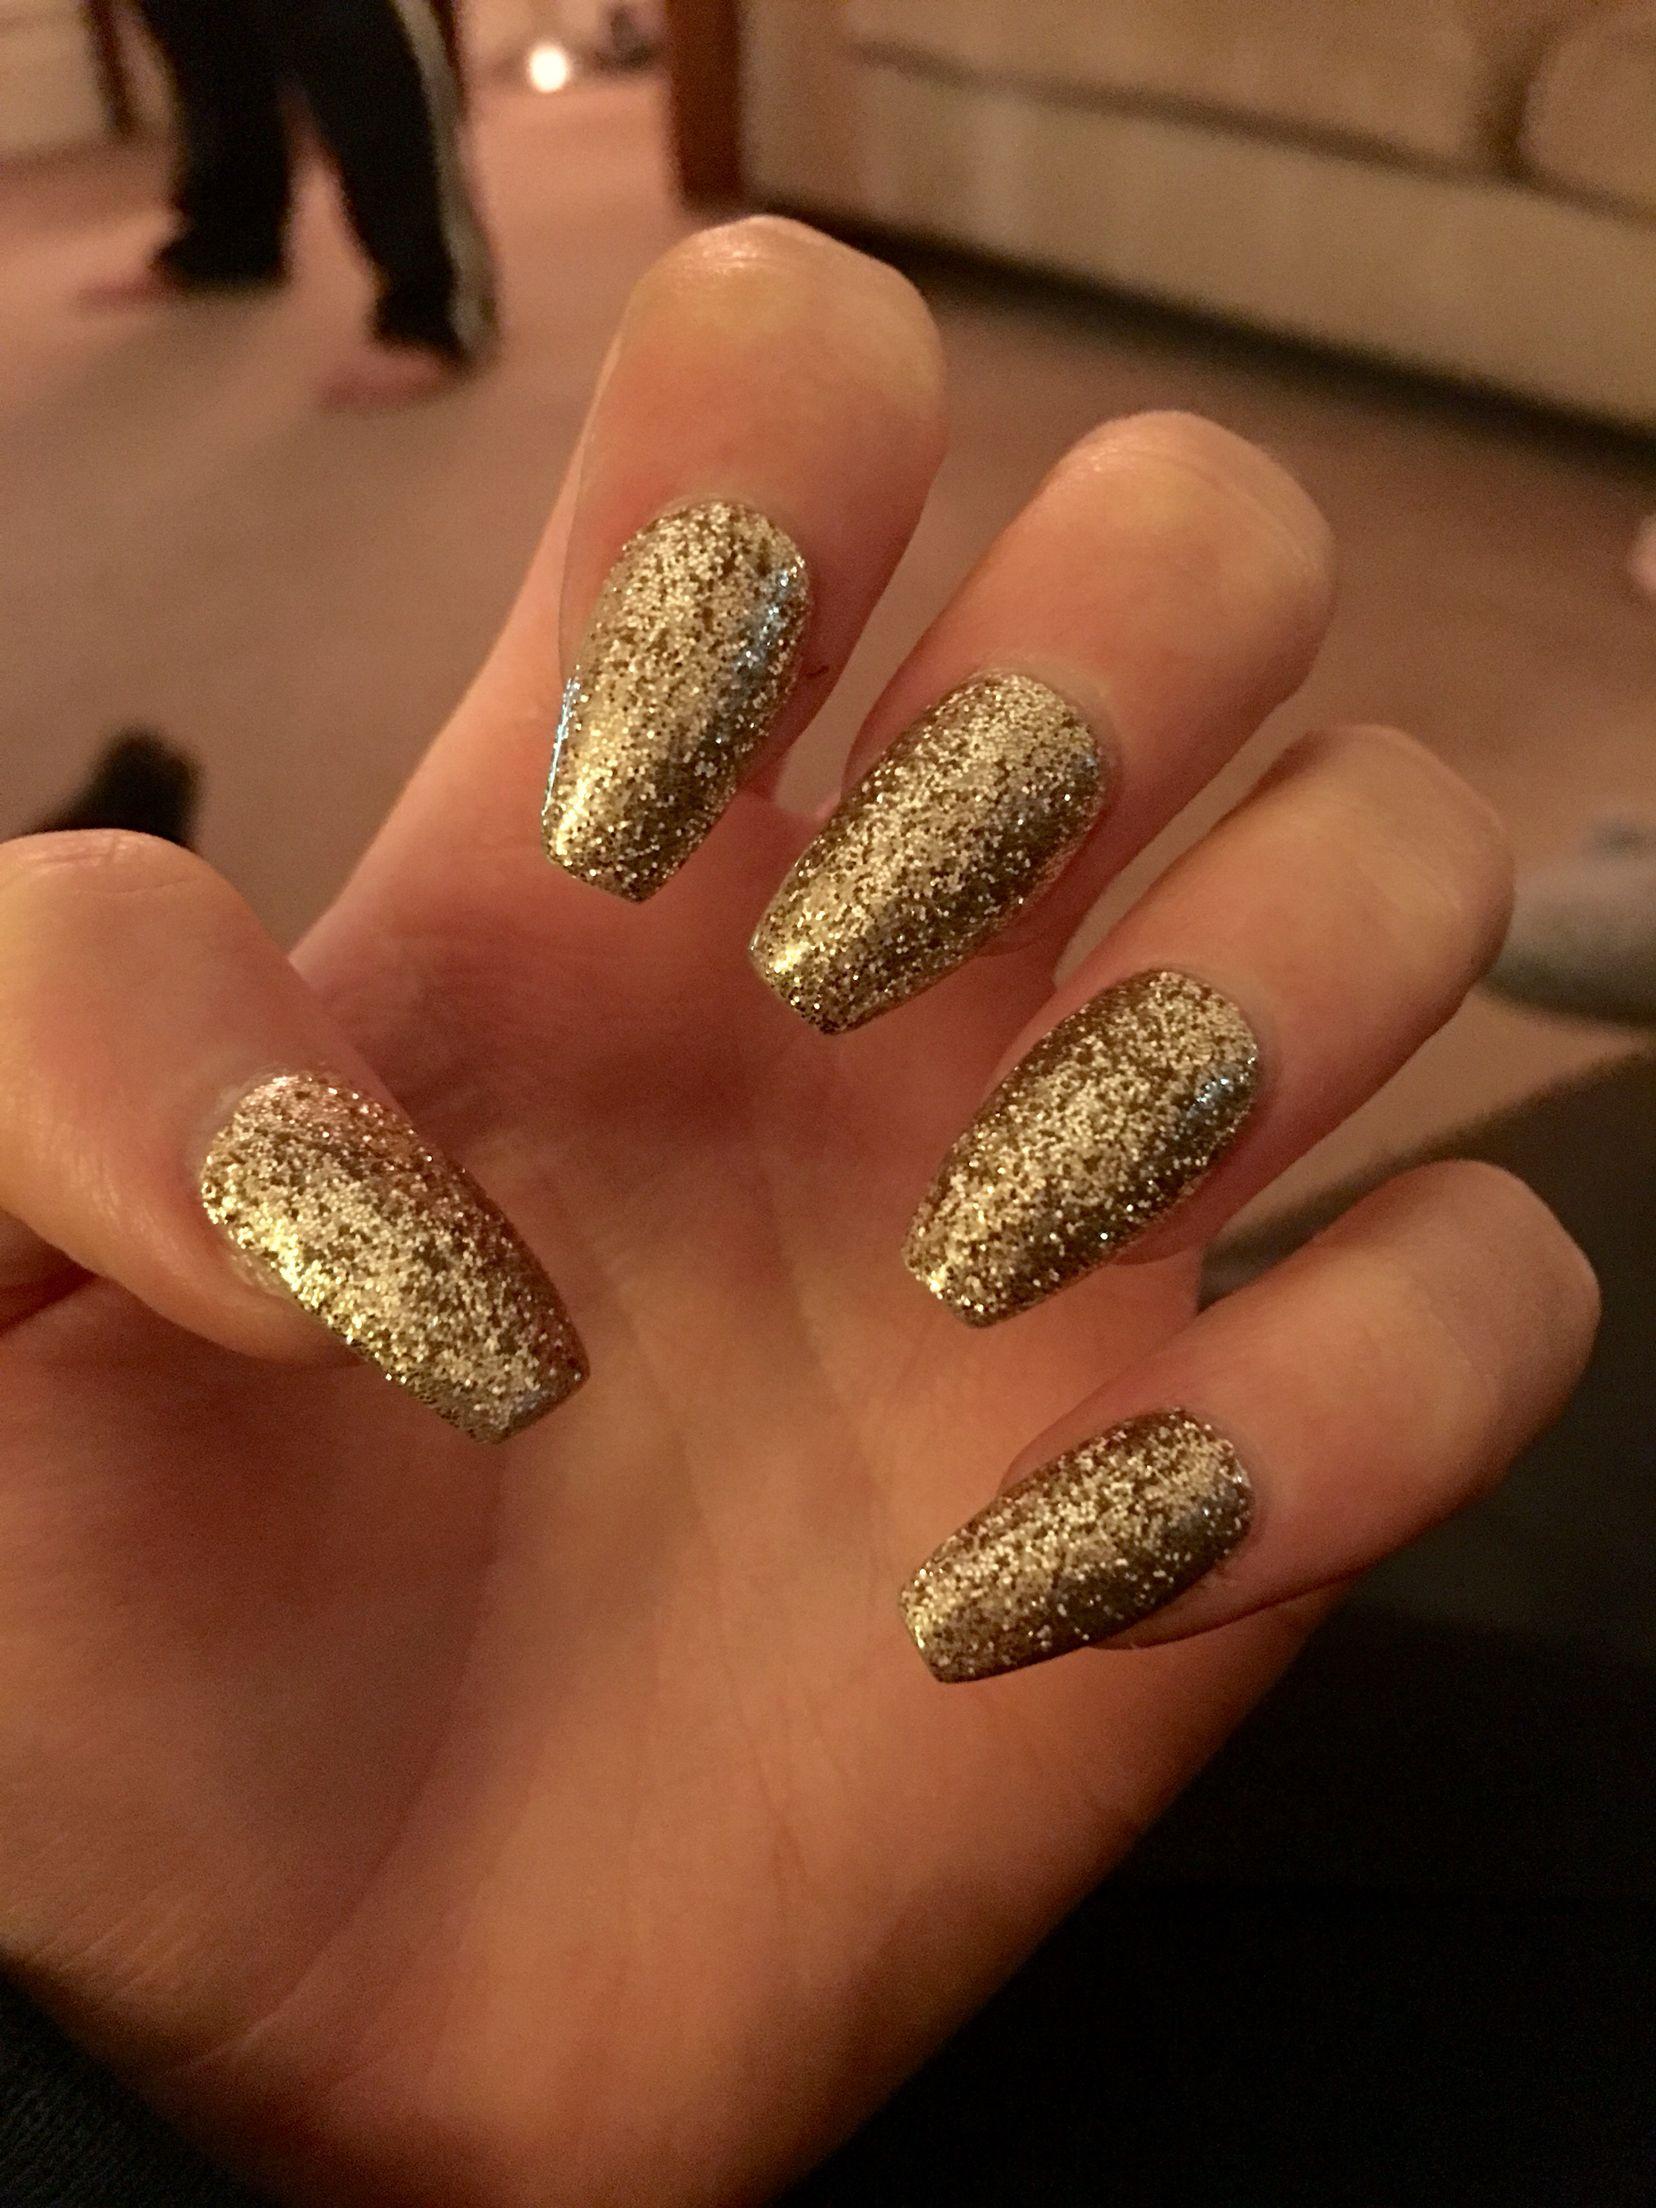 Acrylic Gold Glitter Nails Gold Nails Gold Glitter Nails Sparkly Acrylic Nails